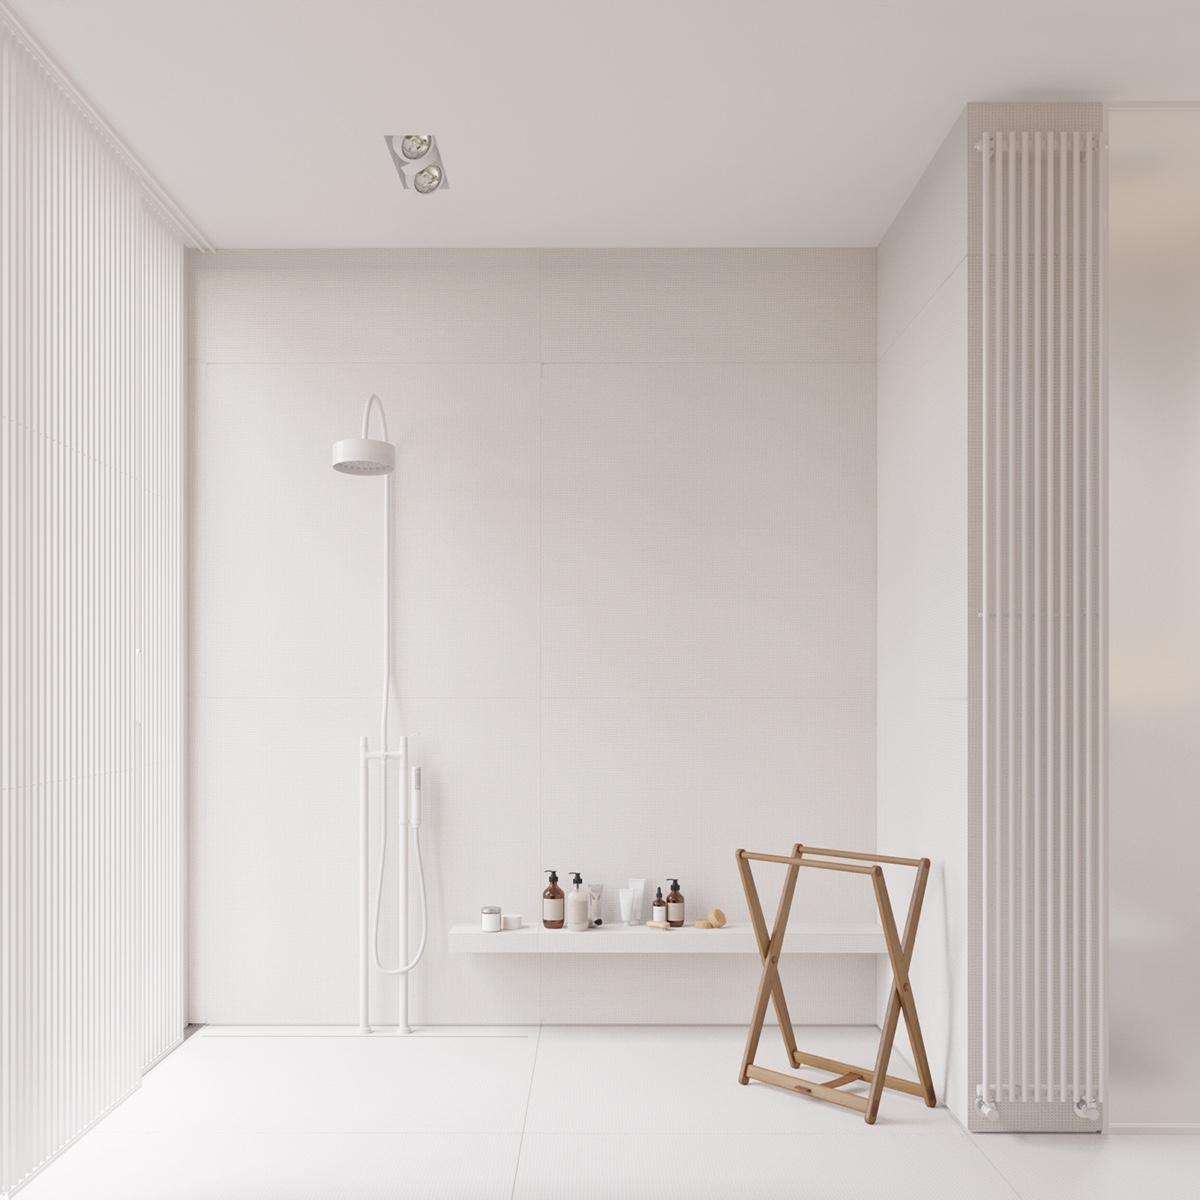 open-shower-white-bathroom-bathroom-accessory